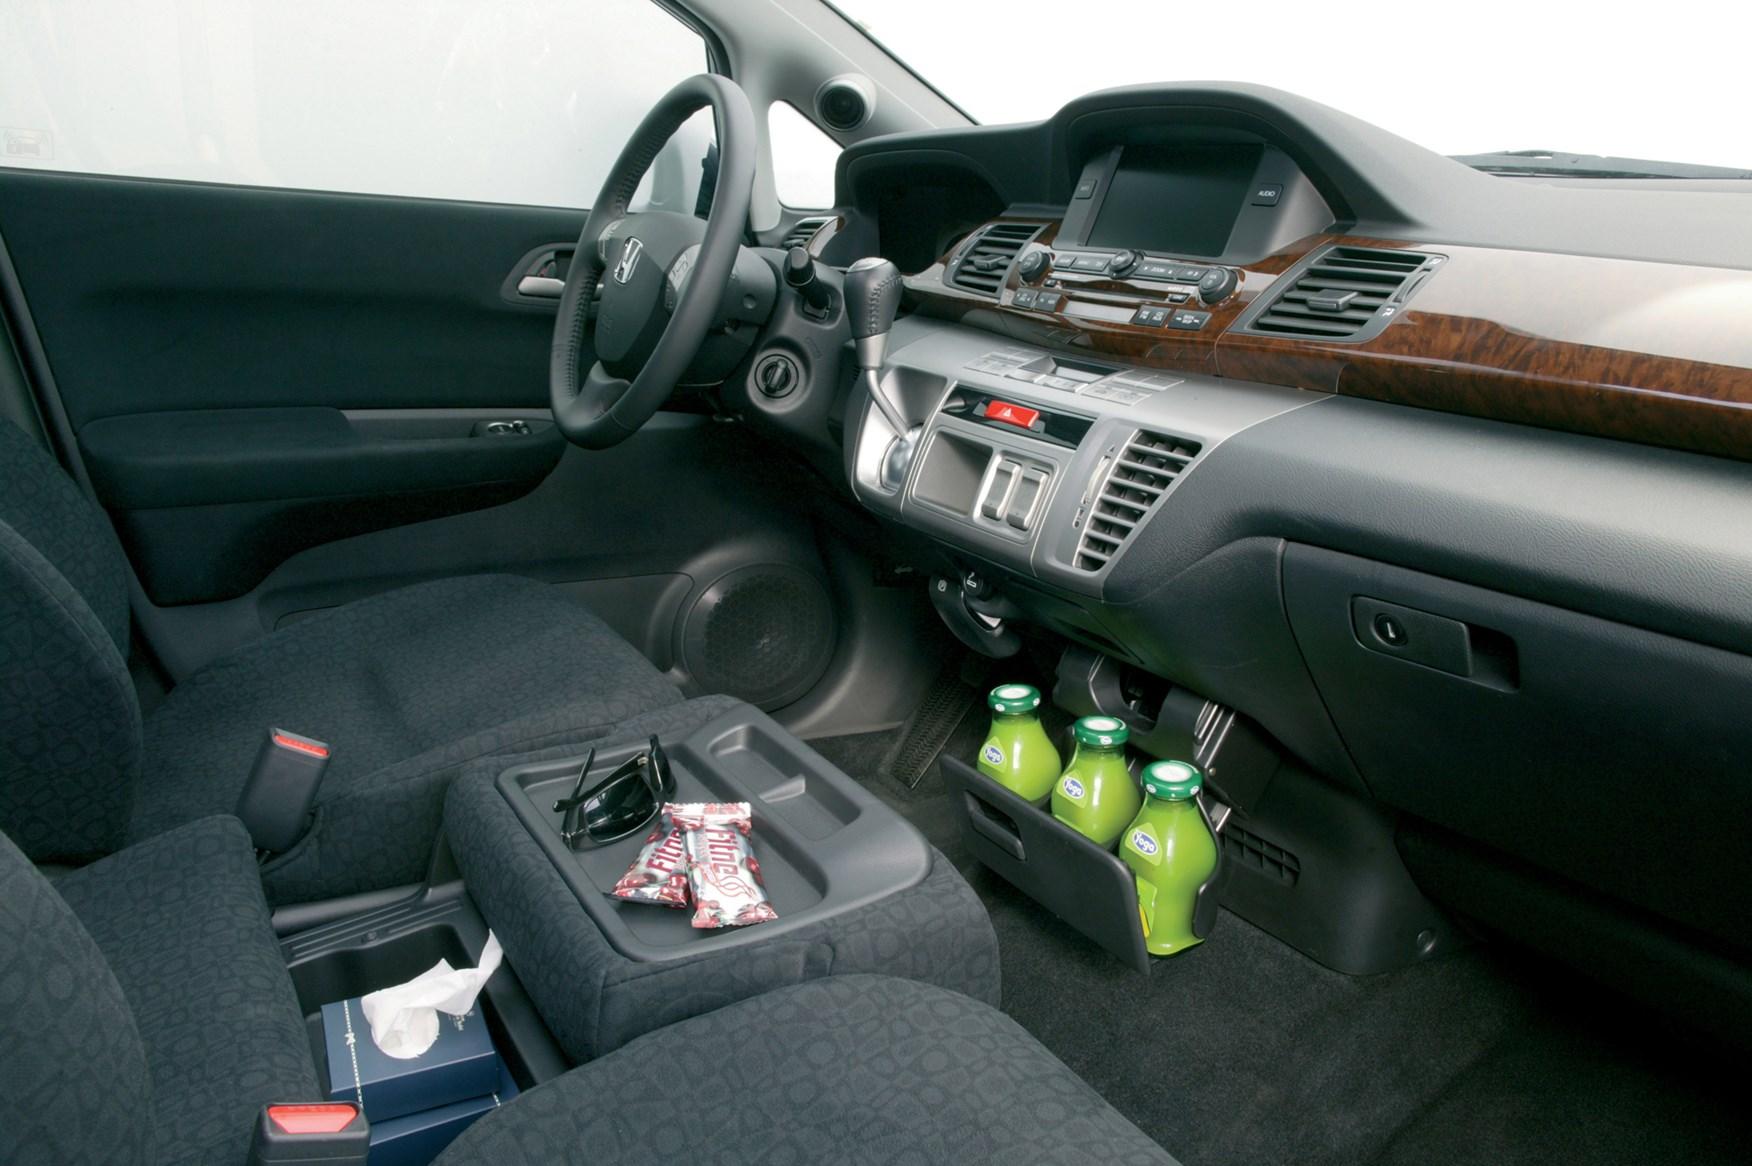 honda fr v hatchback review 2004 2009 parkers rh parkers co uk Honda Edix Honda HR-V